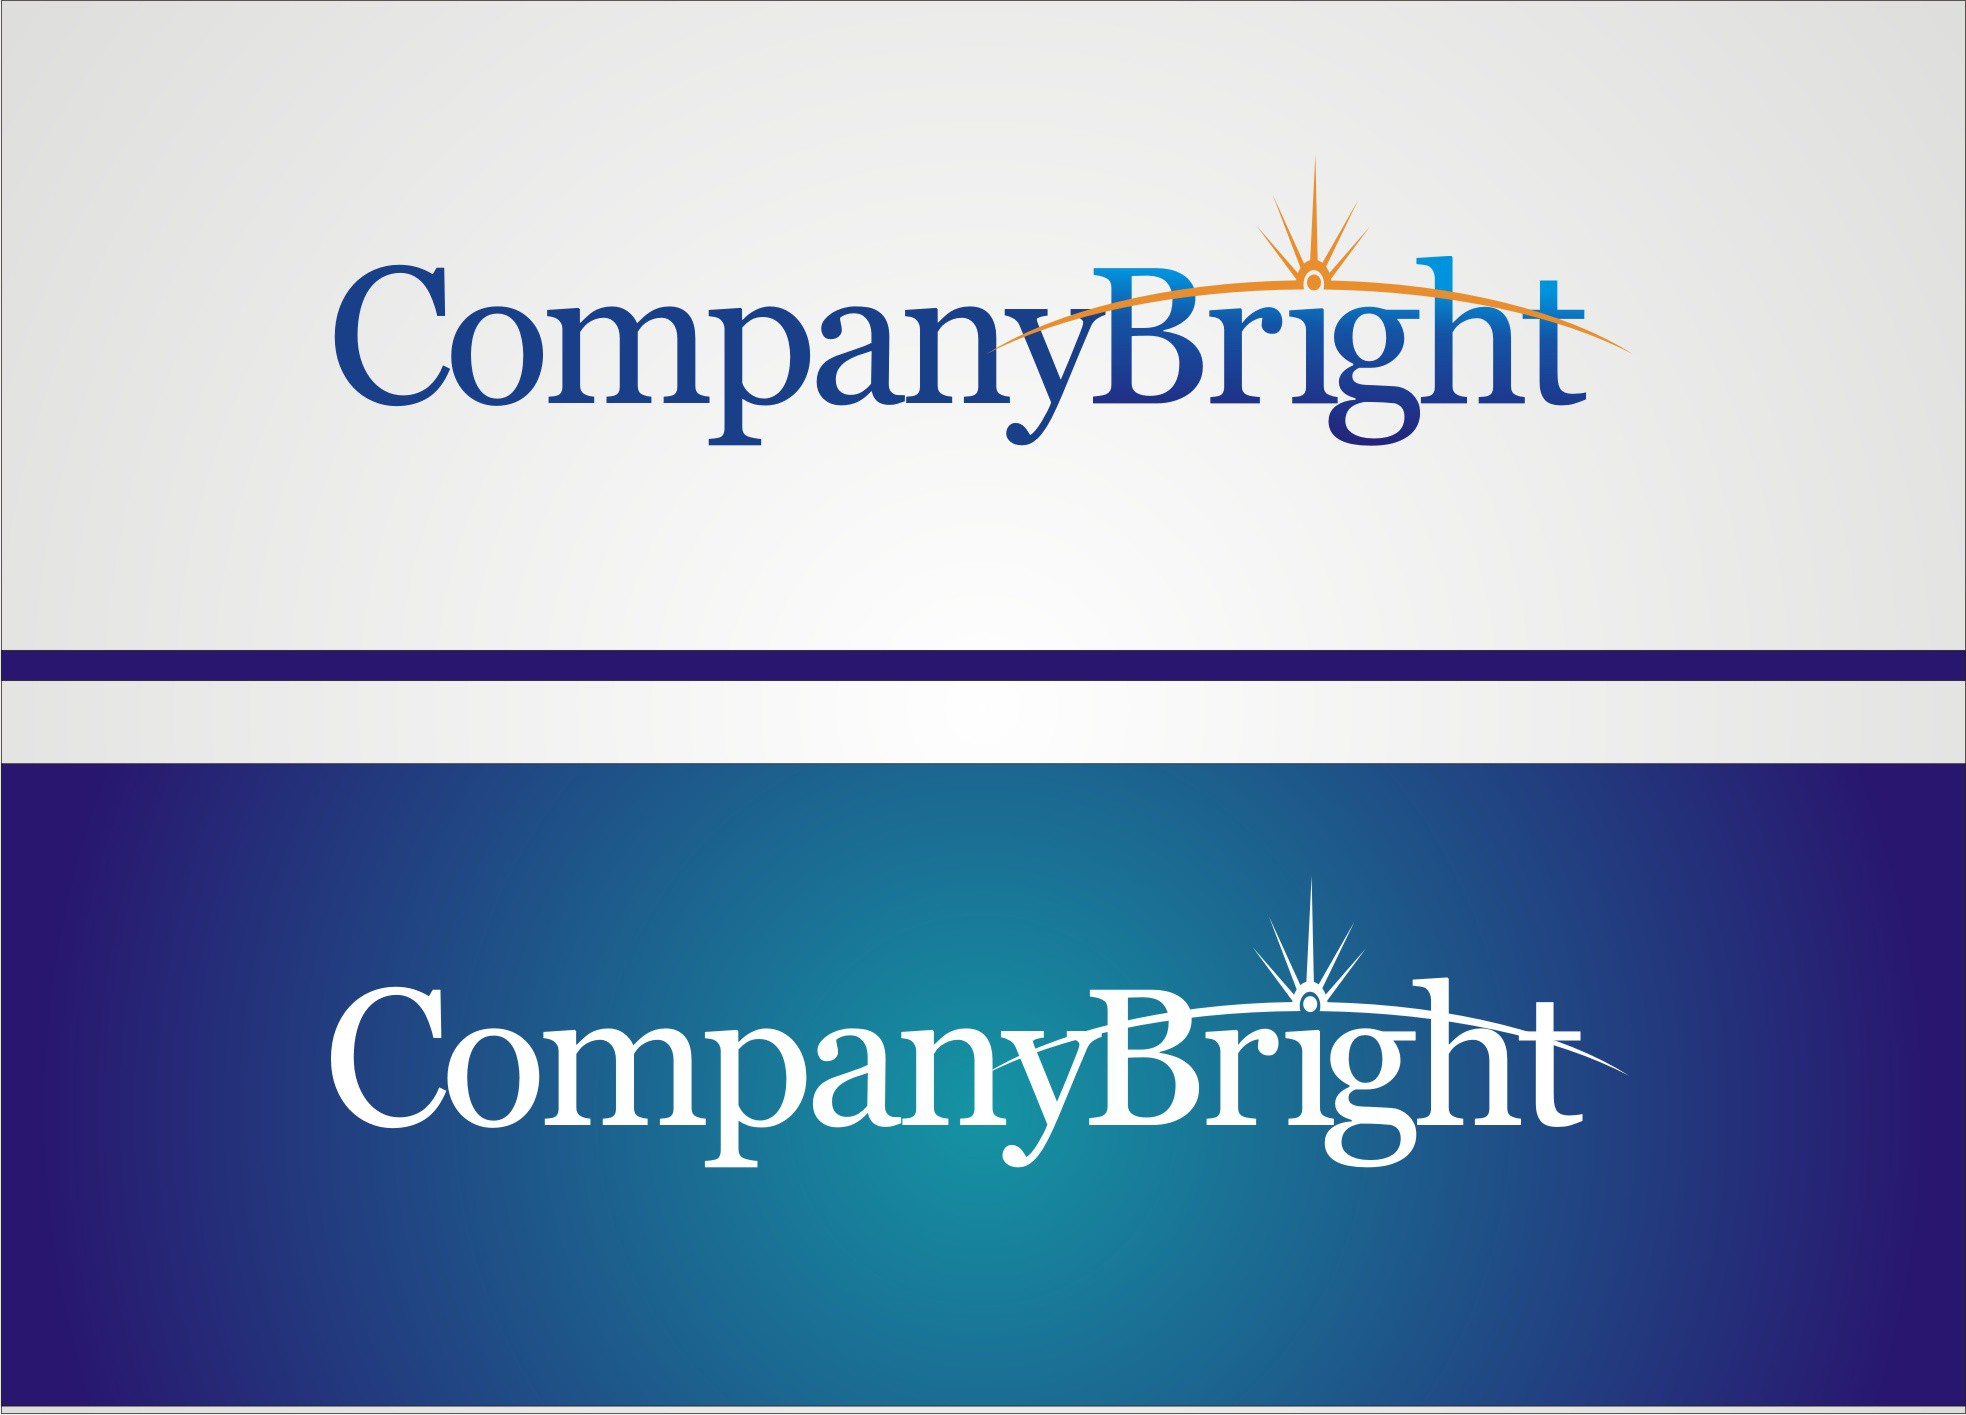 CompanyBright needs a new logo